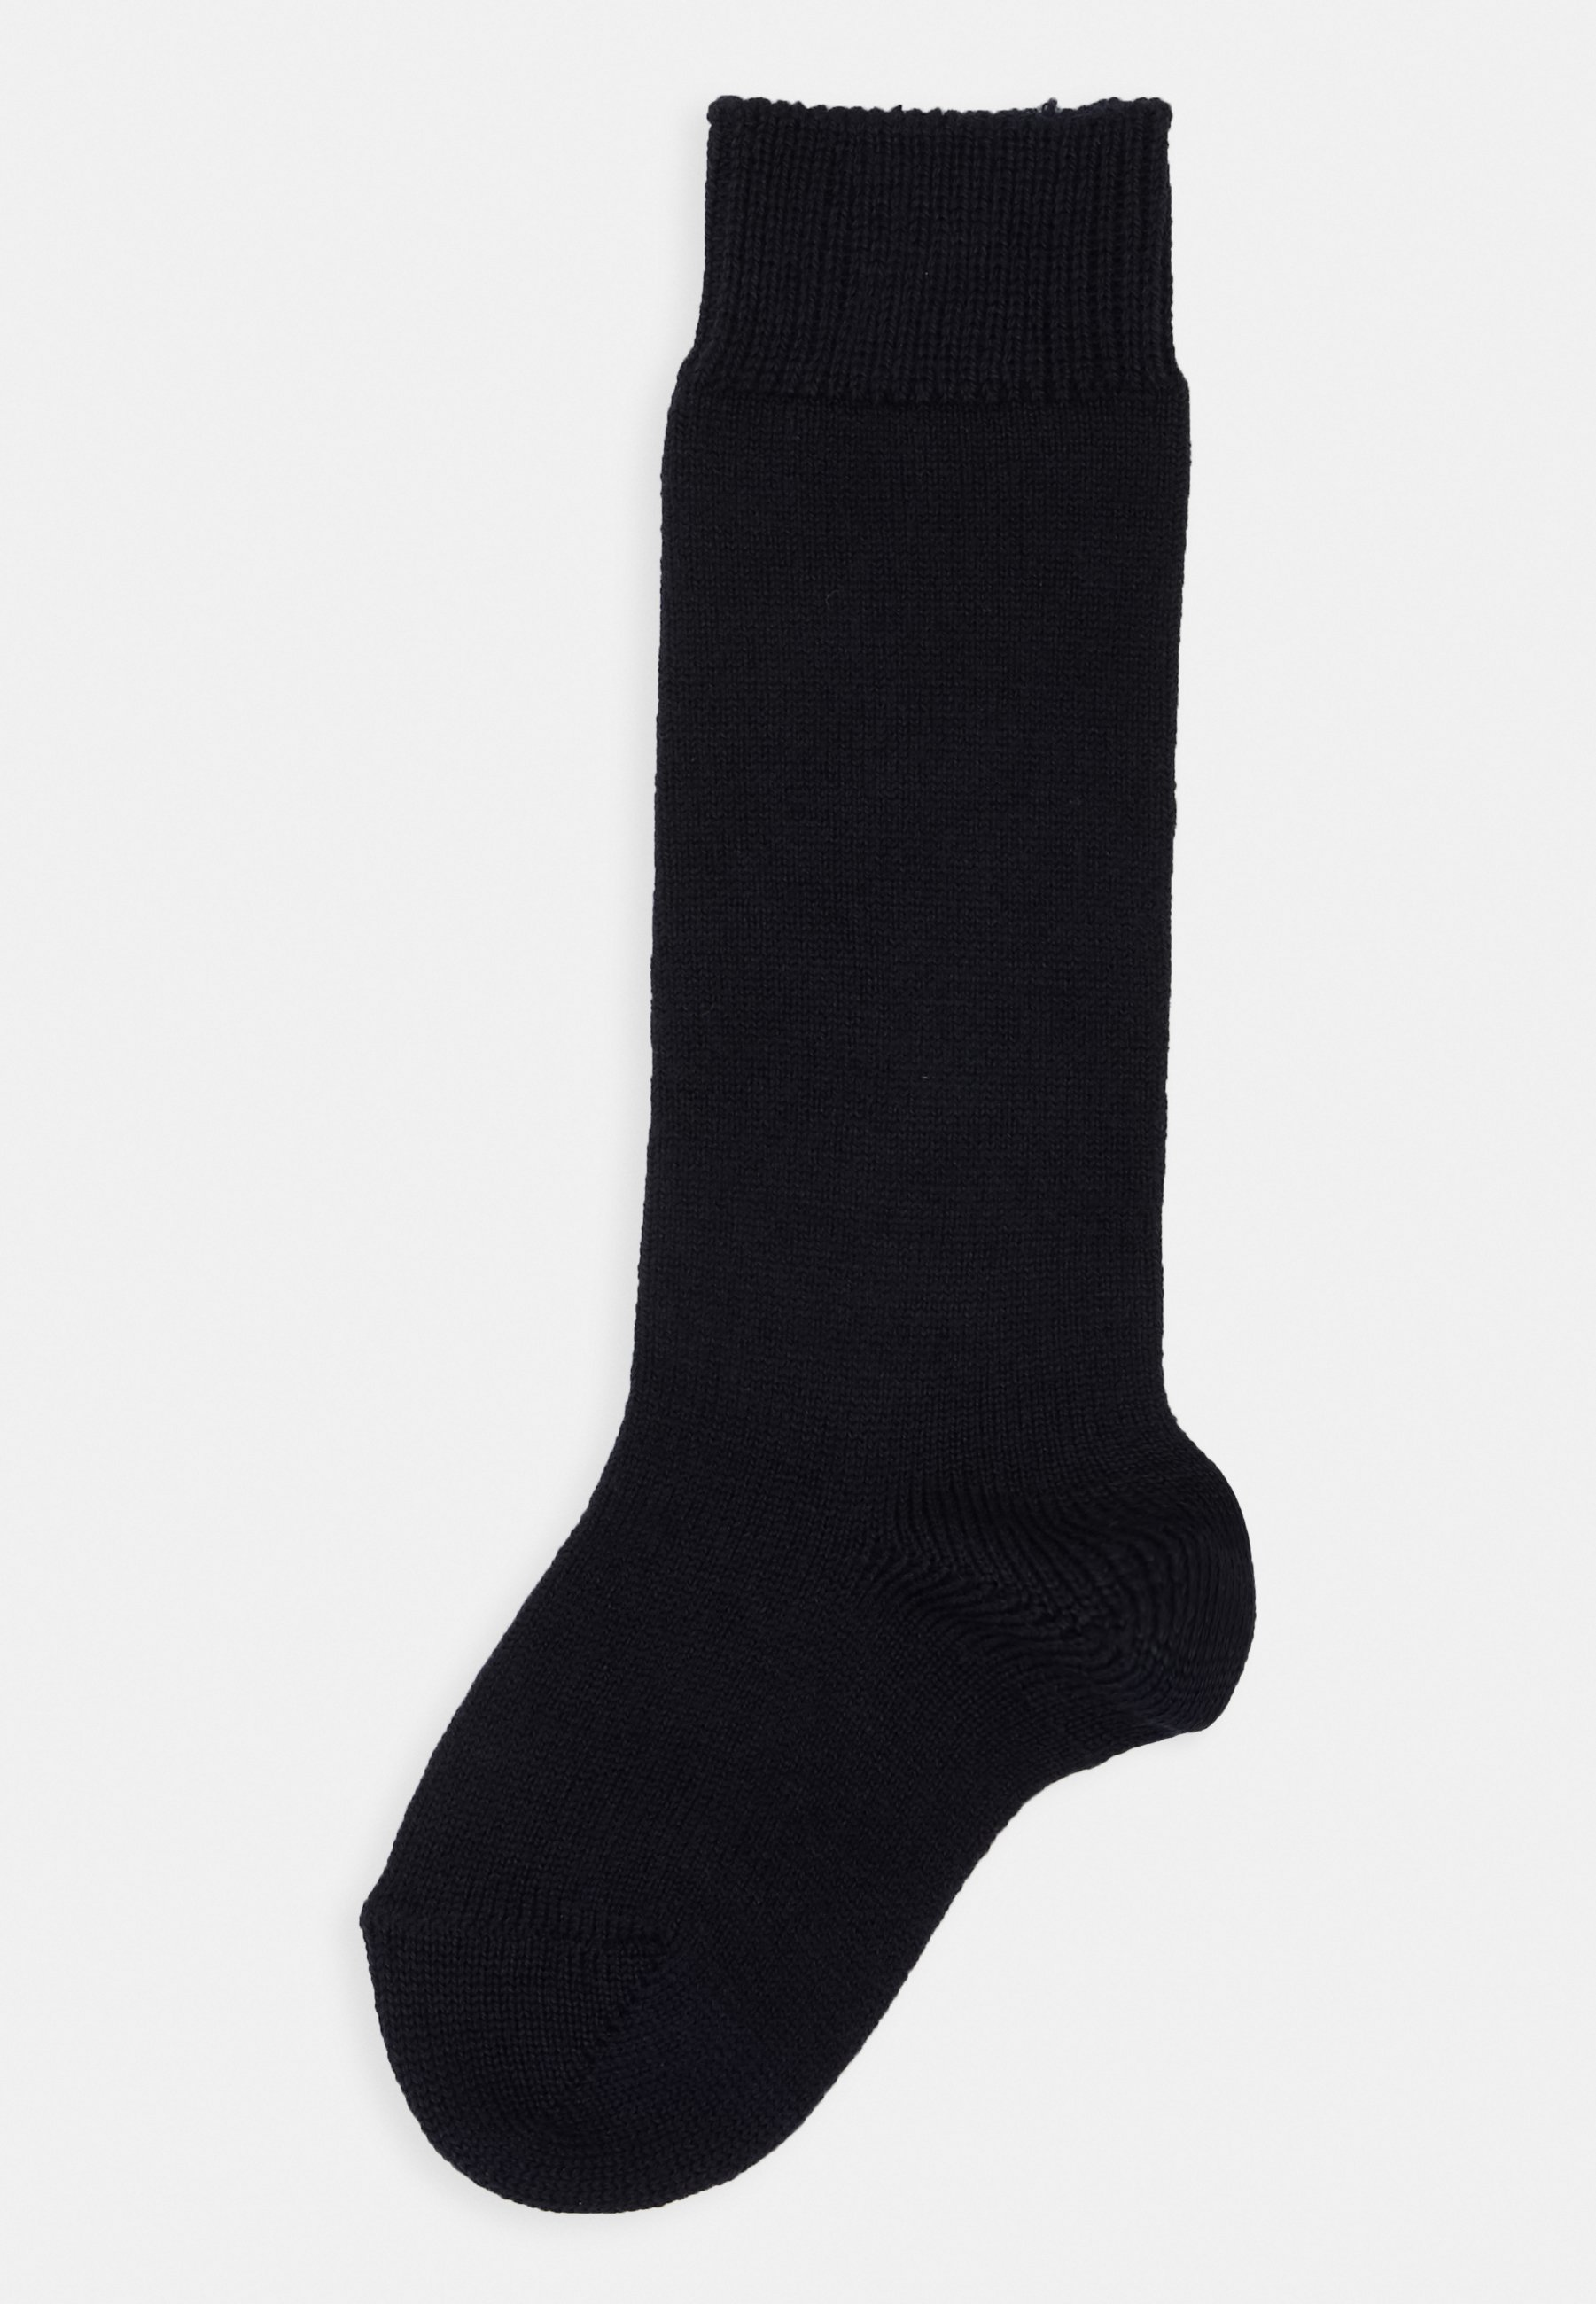 Kids COMFORT WOOL - Knee high socks